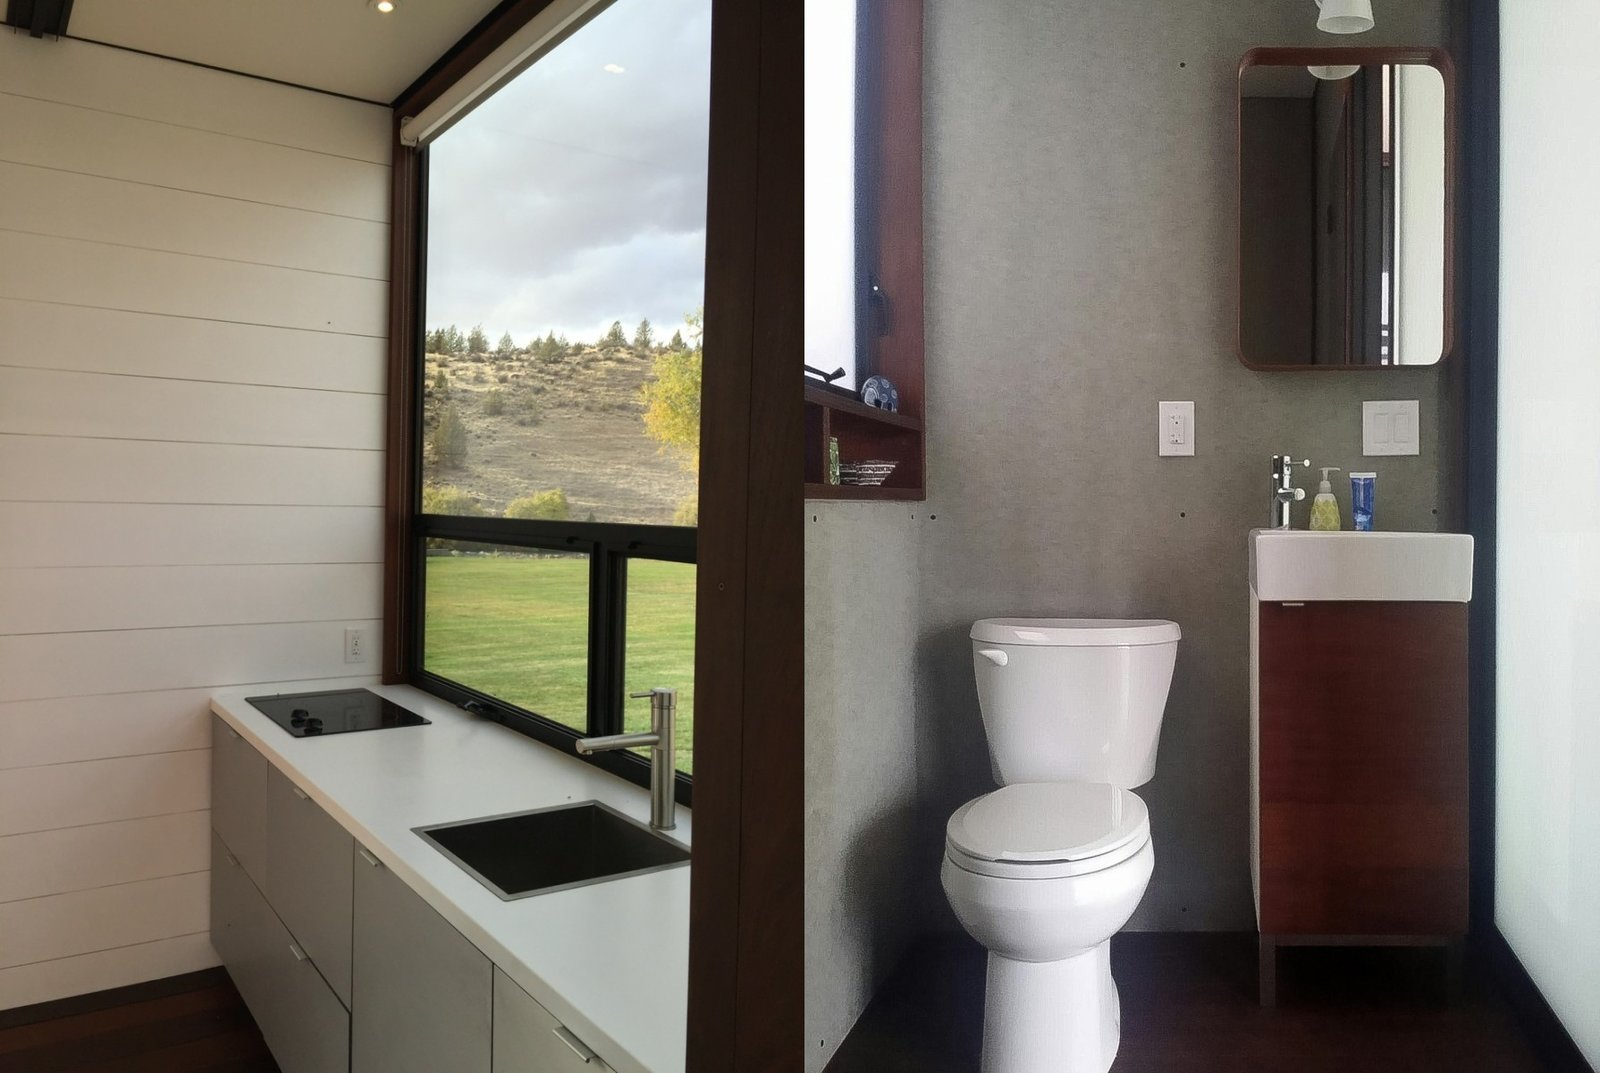 KitHaus modular homes offer modern touches, like sleek, angular designs and vanities made of timber.